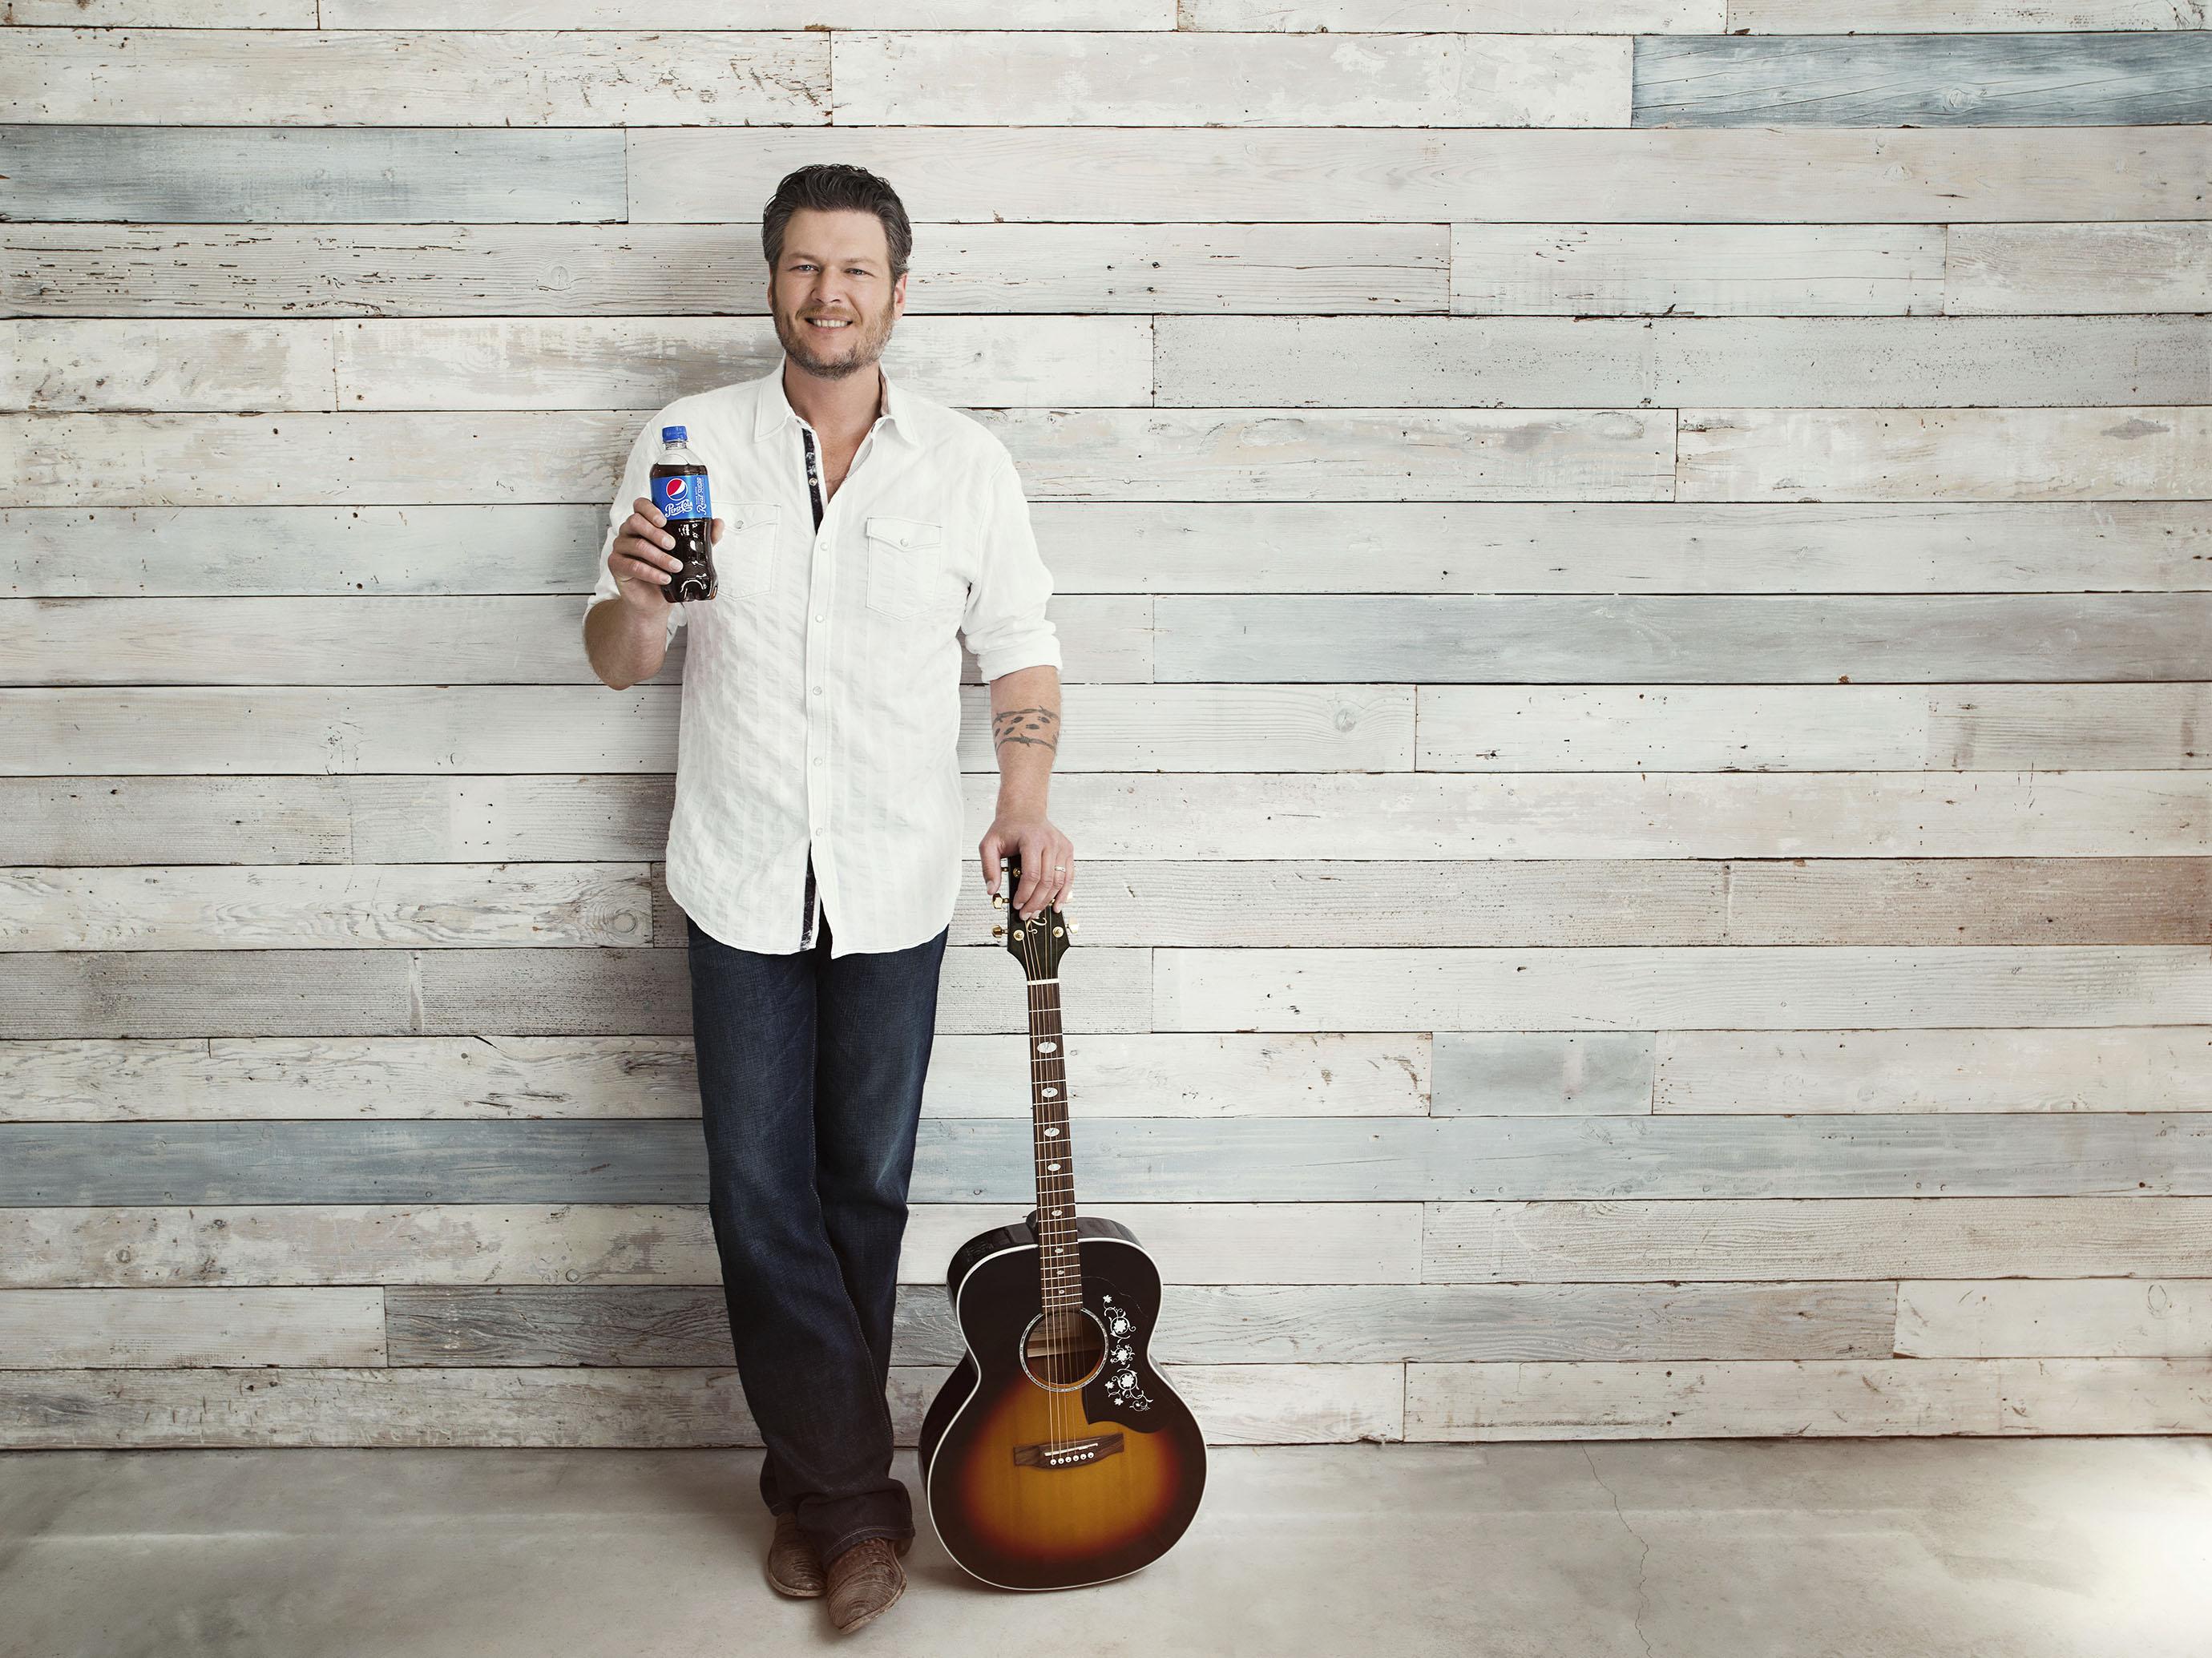 Pepsi's new All-American voice: Blake Shelton